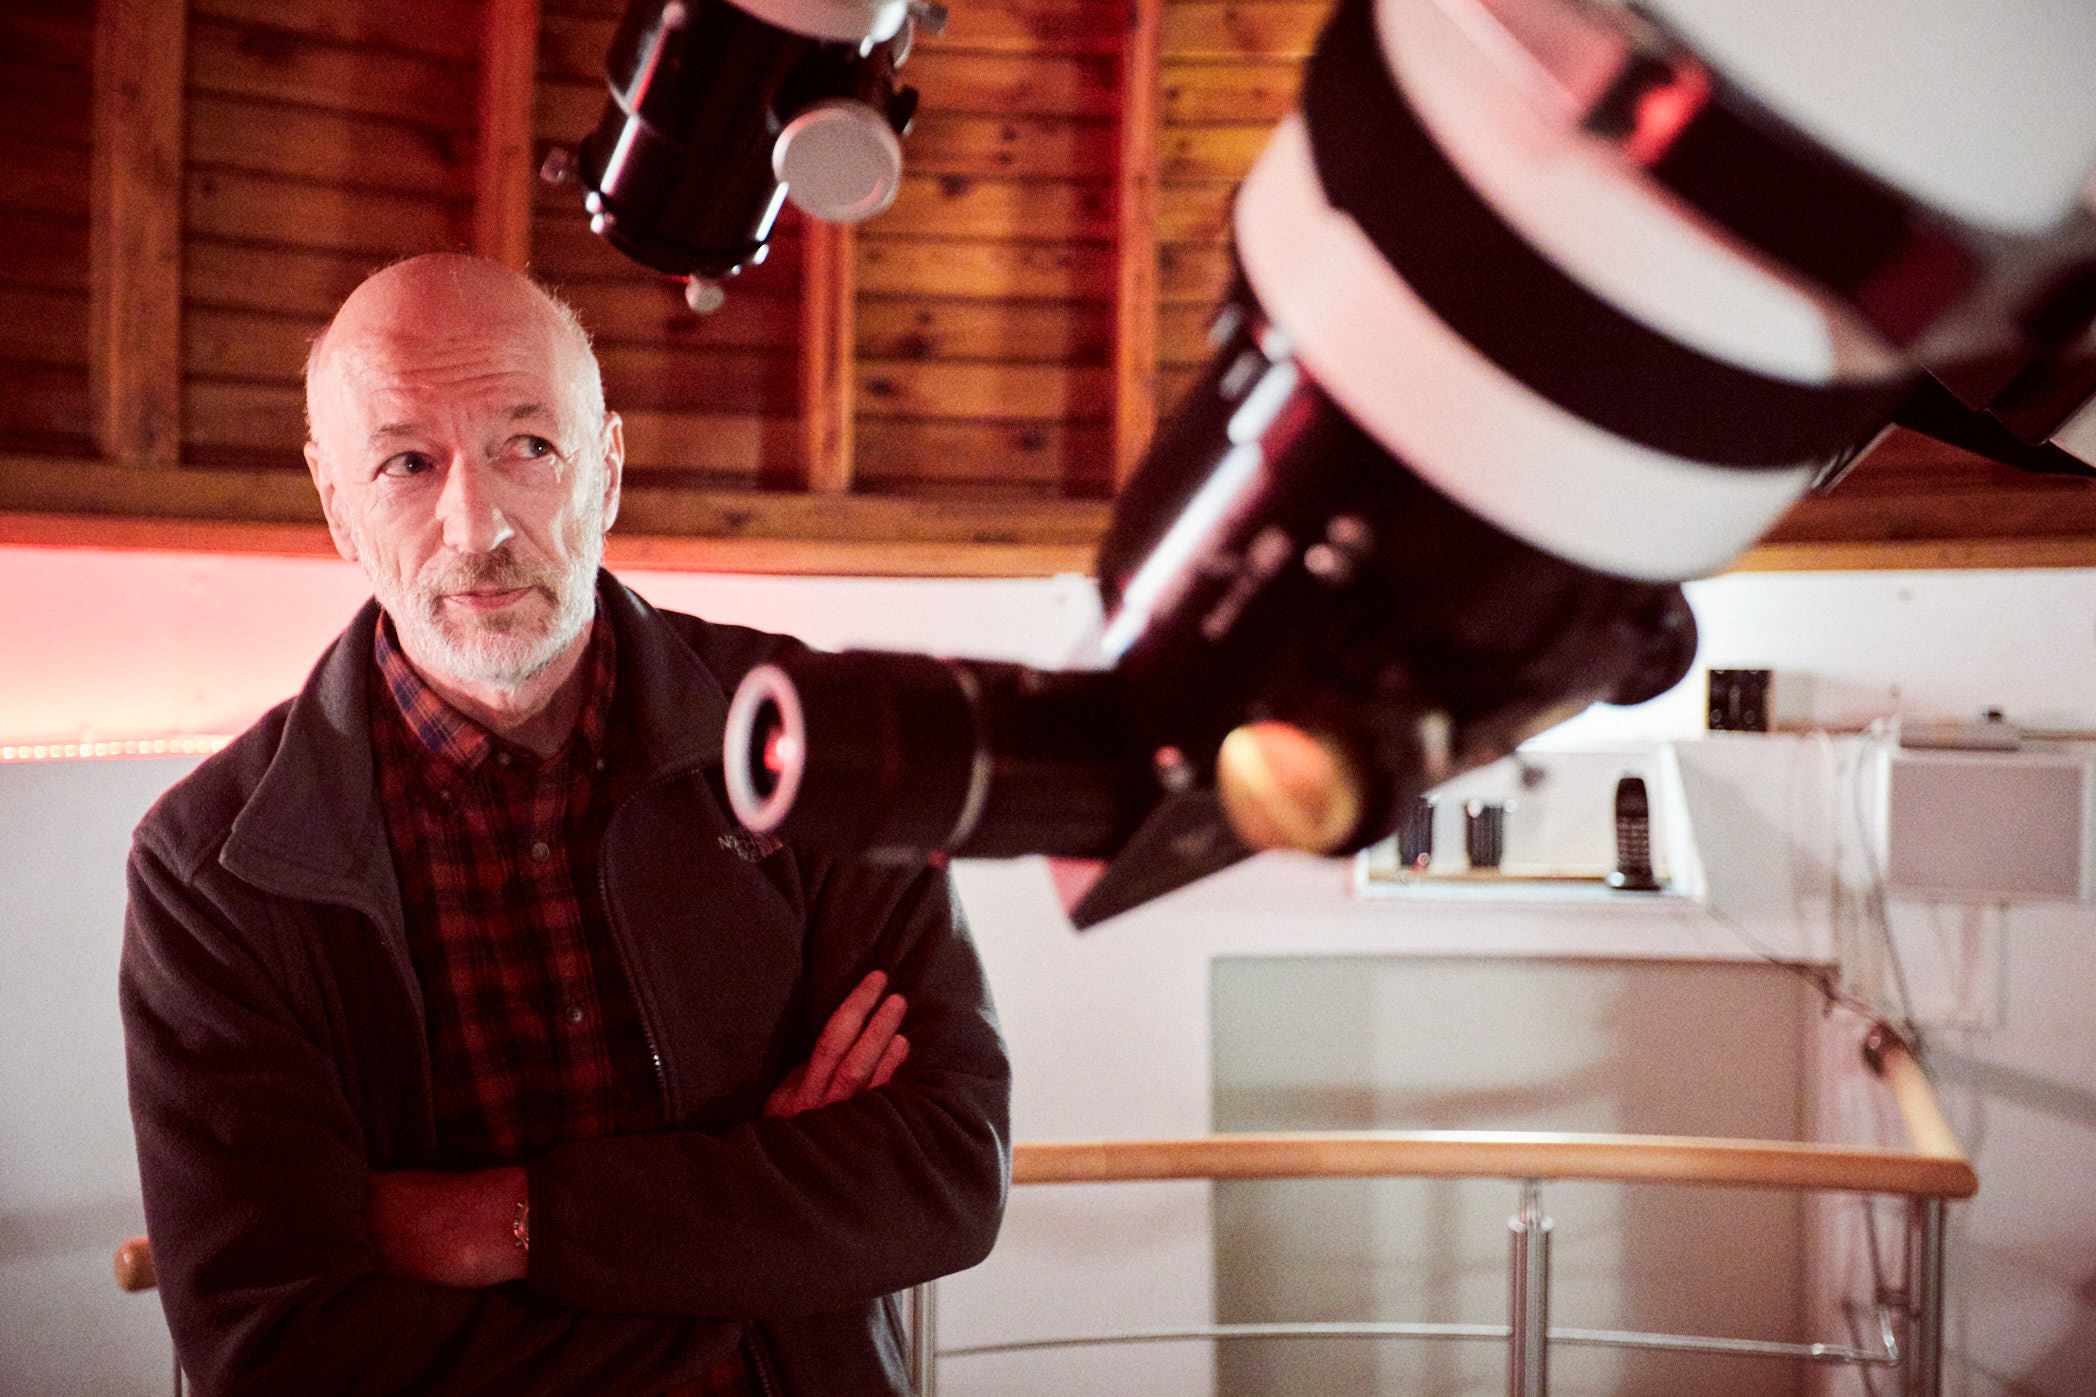 volkssternwarte köln hobby-astronom teleskop verschränkte arme joern strojny